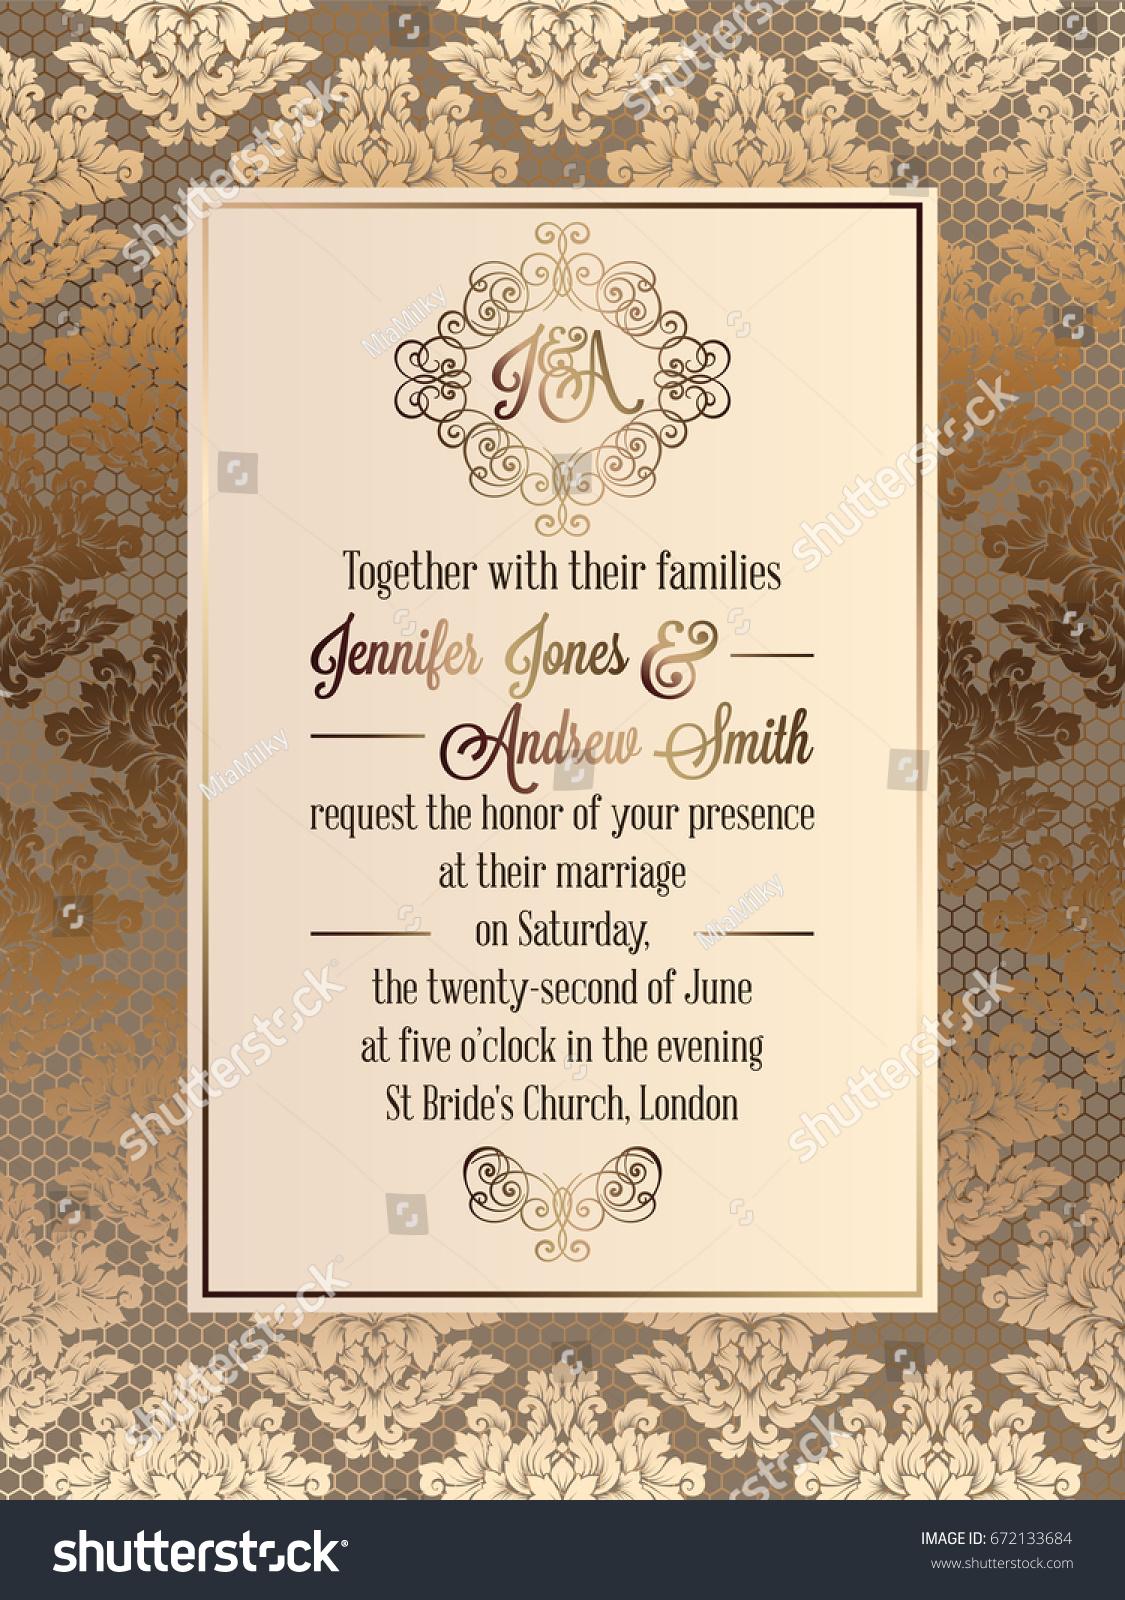 Vintage baroque style wedding invitation card stock vector vintage baroque style wedding invitation card stock vector 672133684 shutterstock stopboris Choice Image